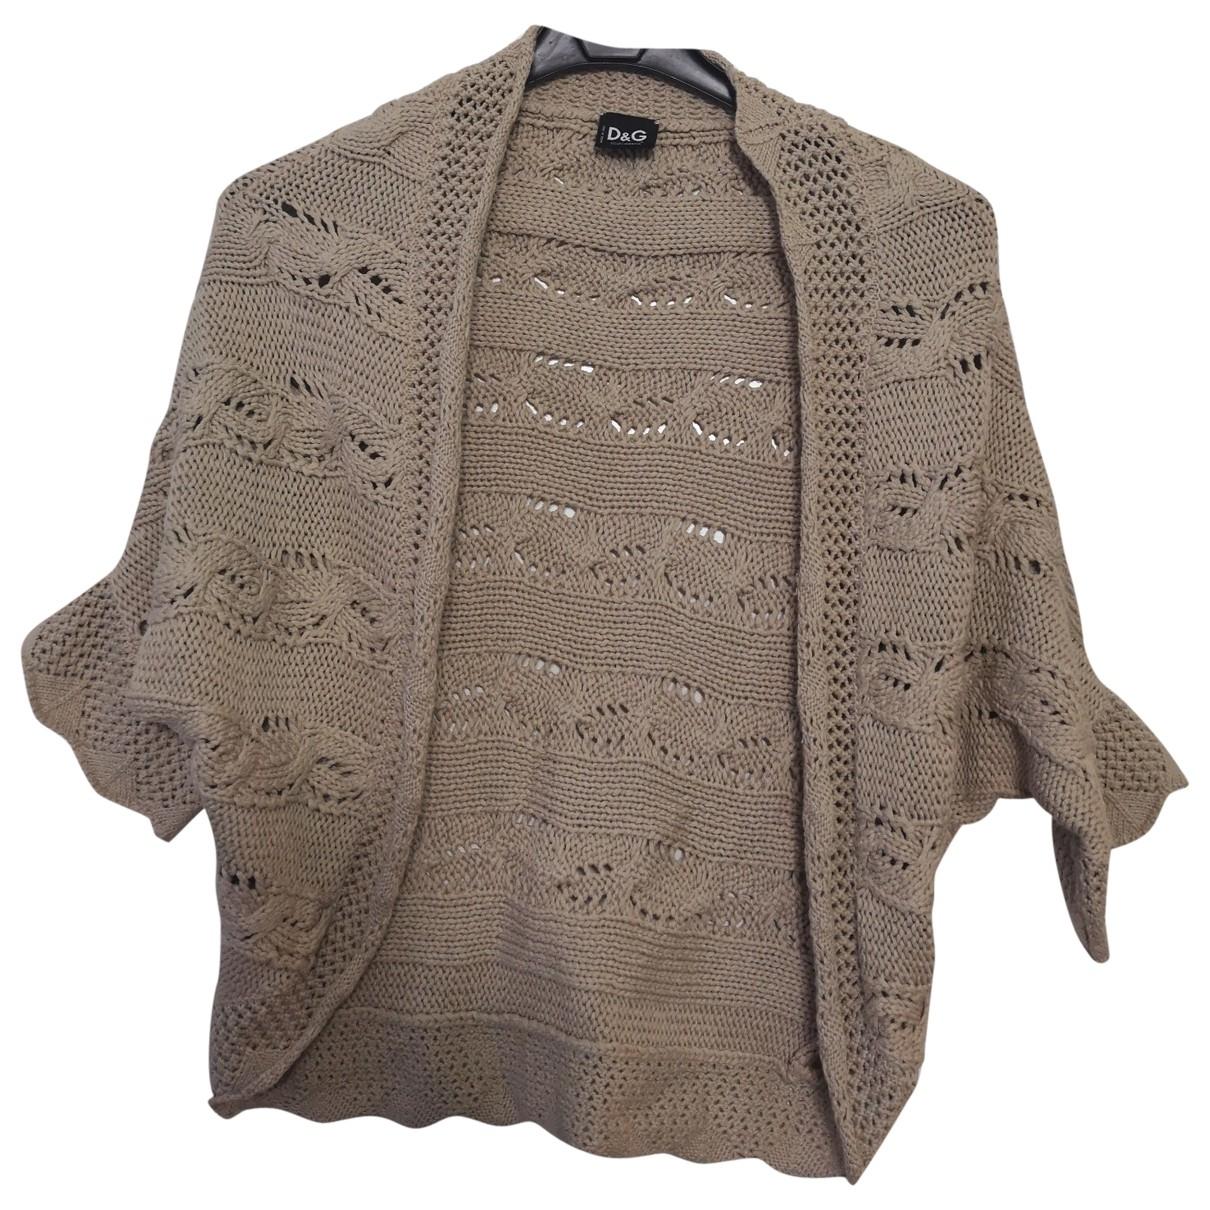 D&g \N Pullover in  Beige Baumwolle